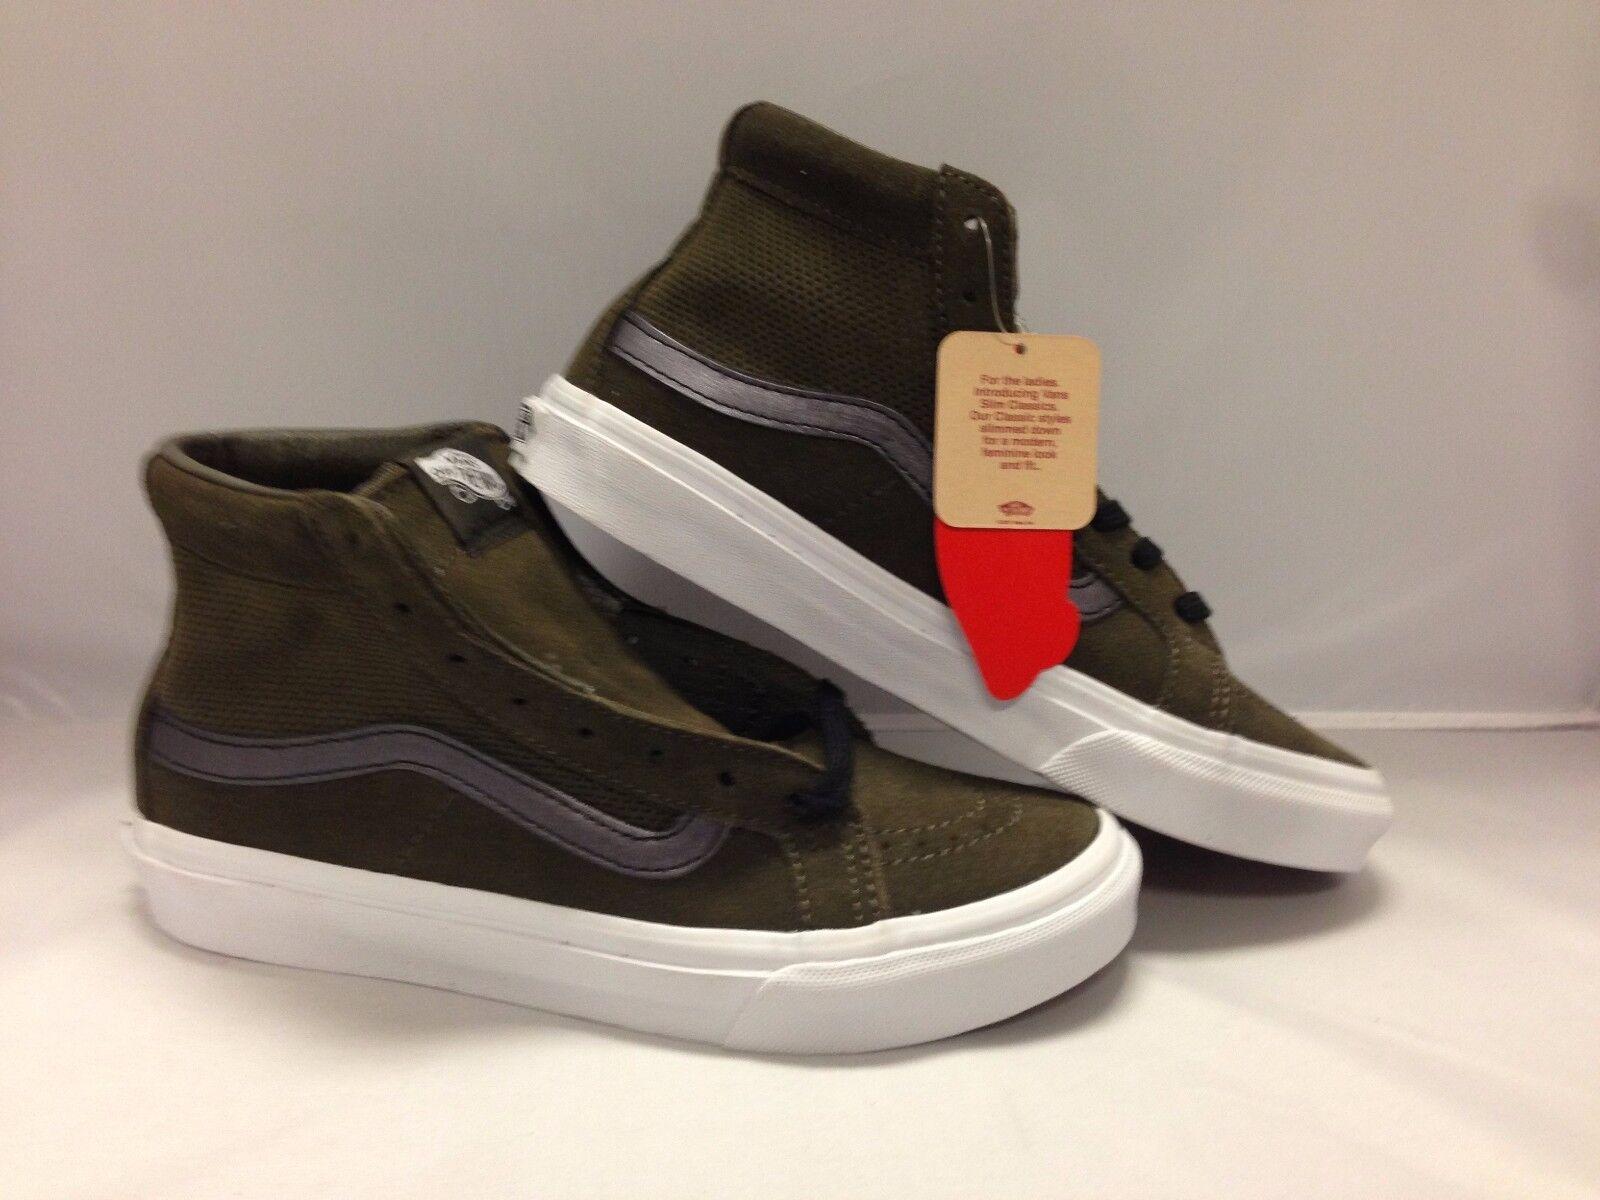 Vans hommes Chaussures ''Sk8'Hi Sim cutout--(Perf Suede)--Tarmac/blanc